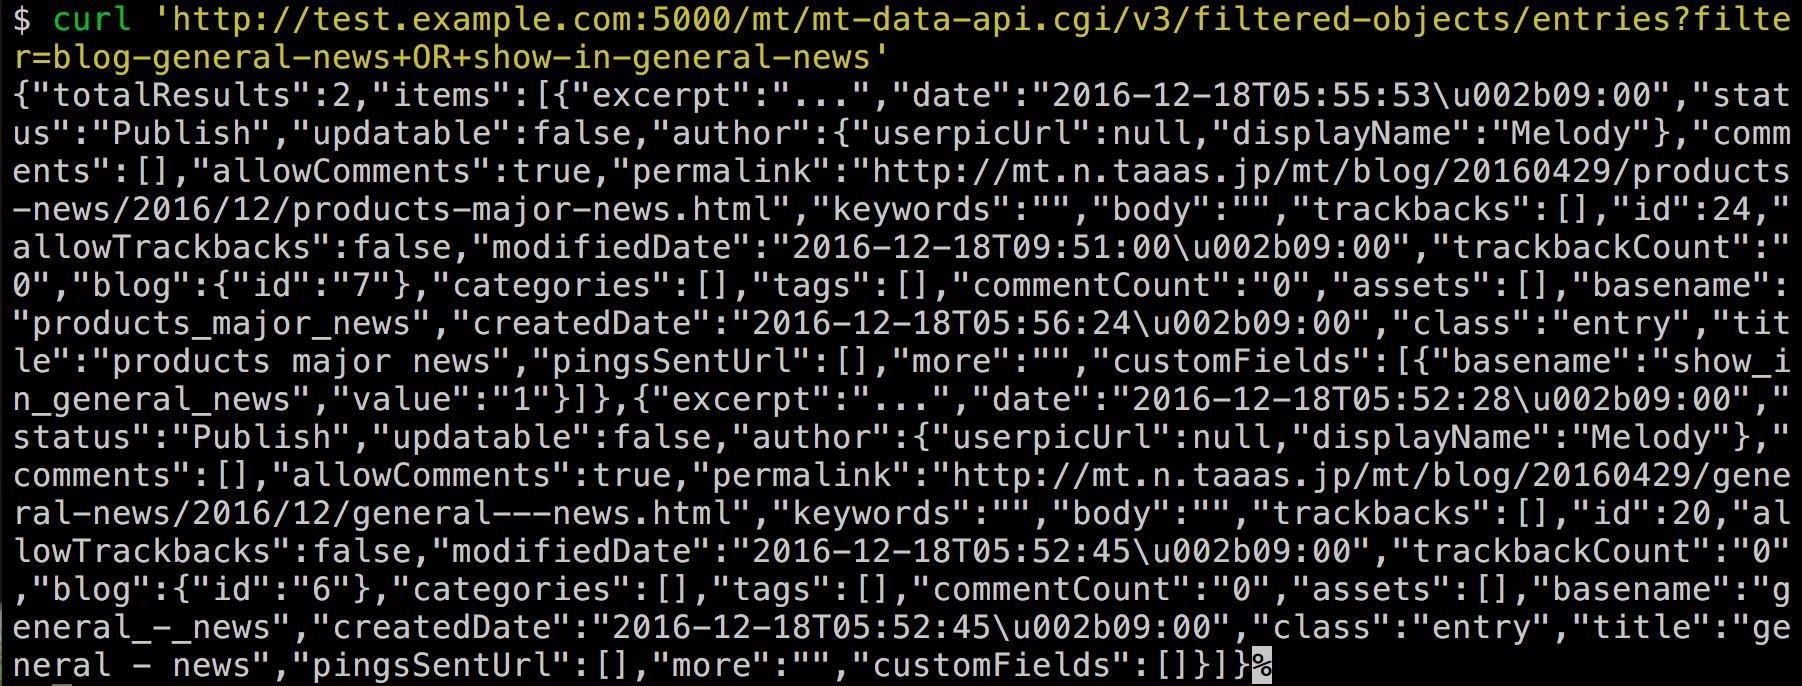 Screenshot - CLI